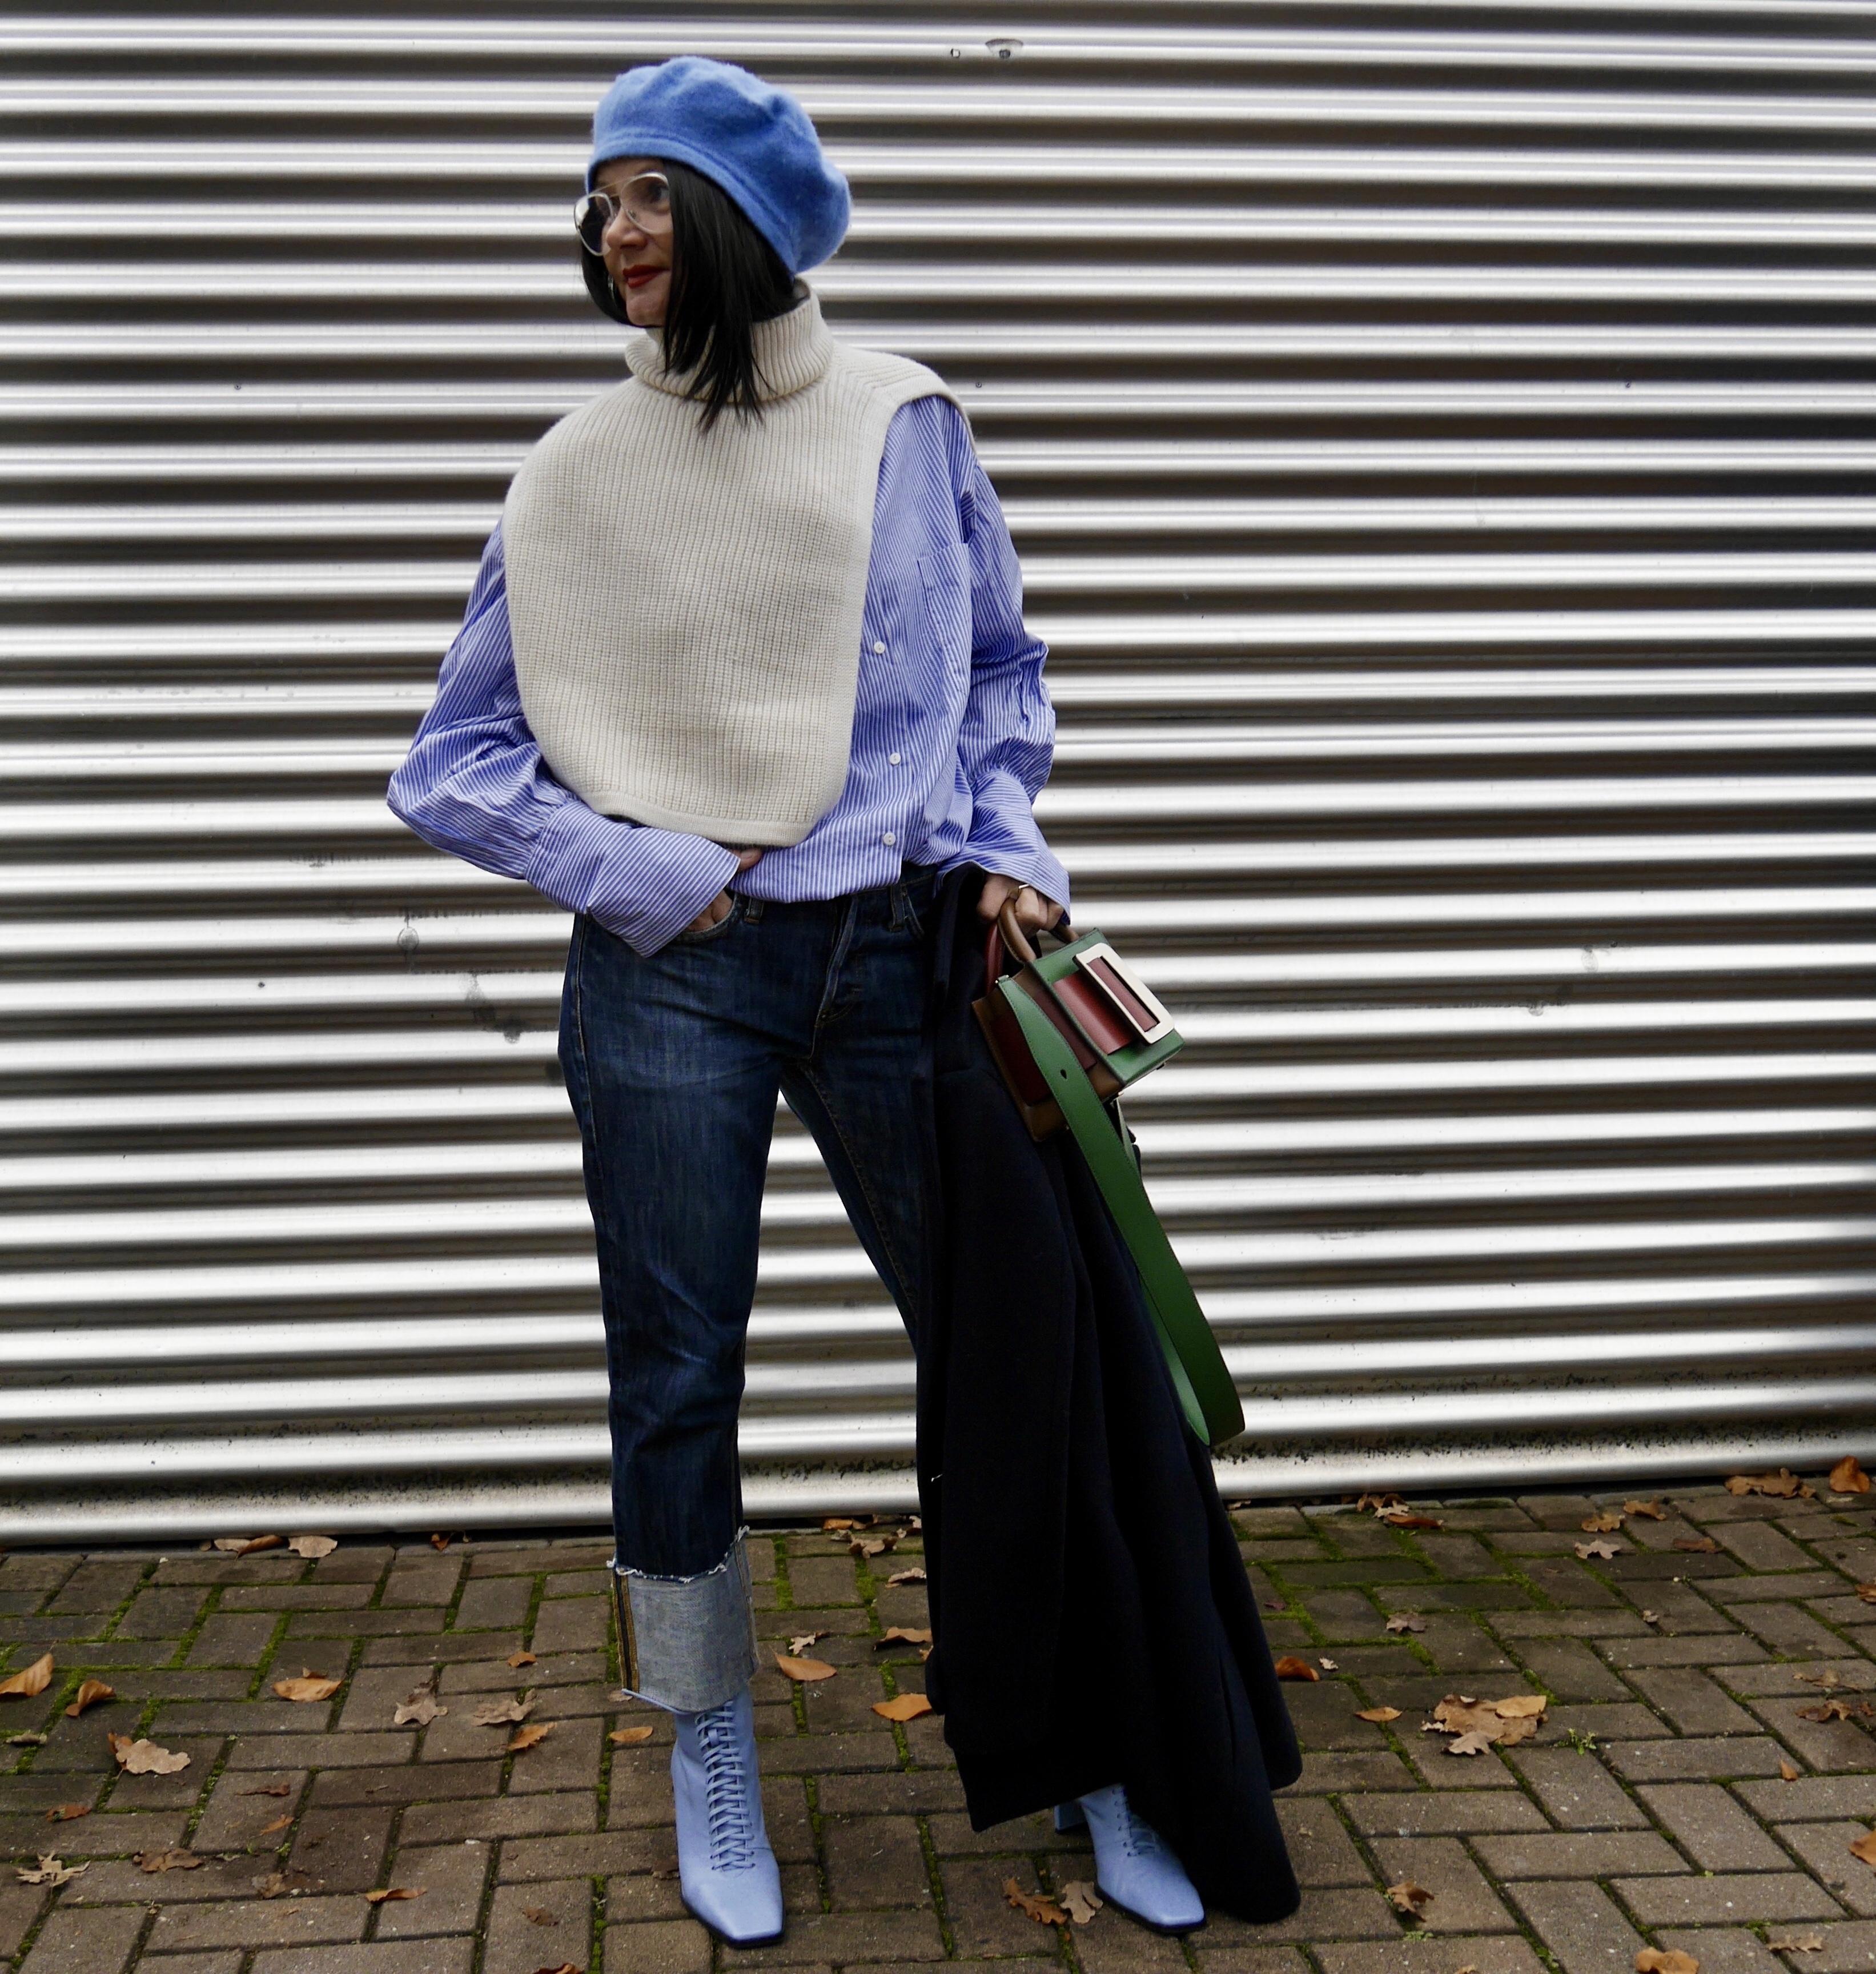 Pullunder über Oversize-Hemd, Jeans umgeschlagen, Boyy-Bag